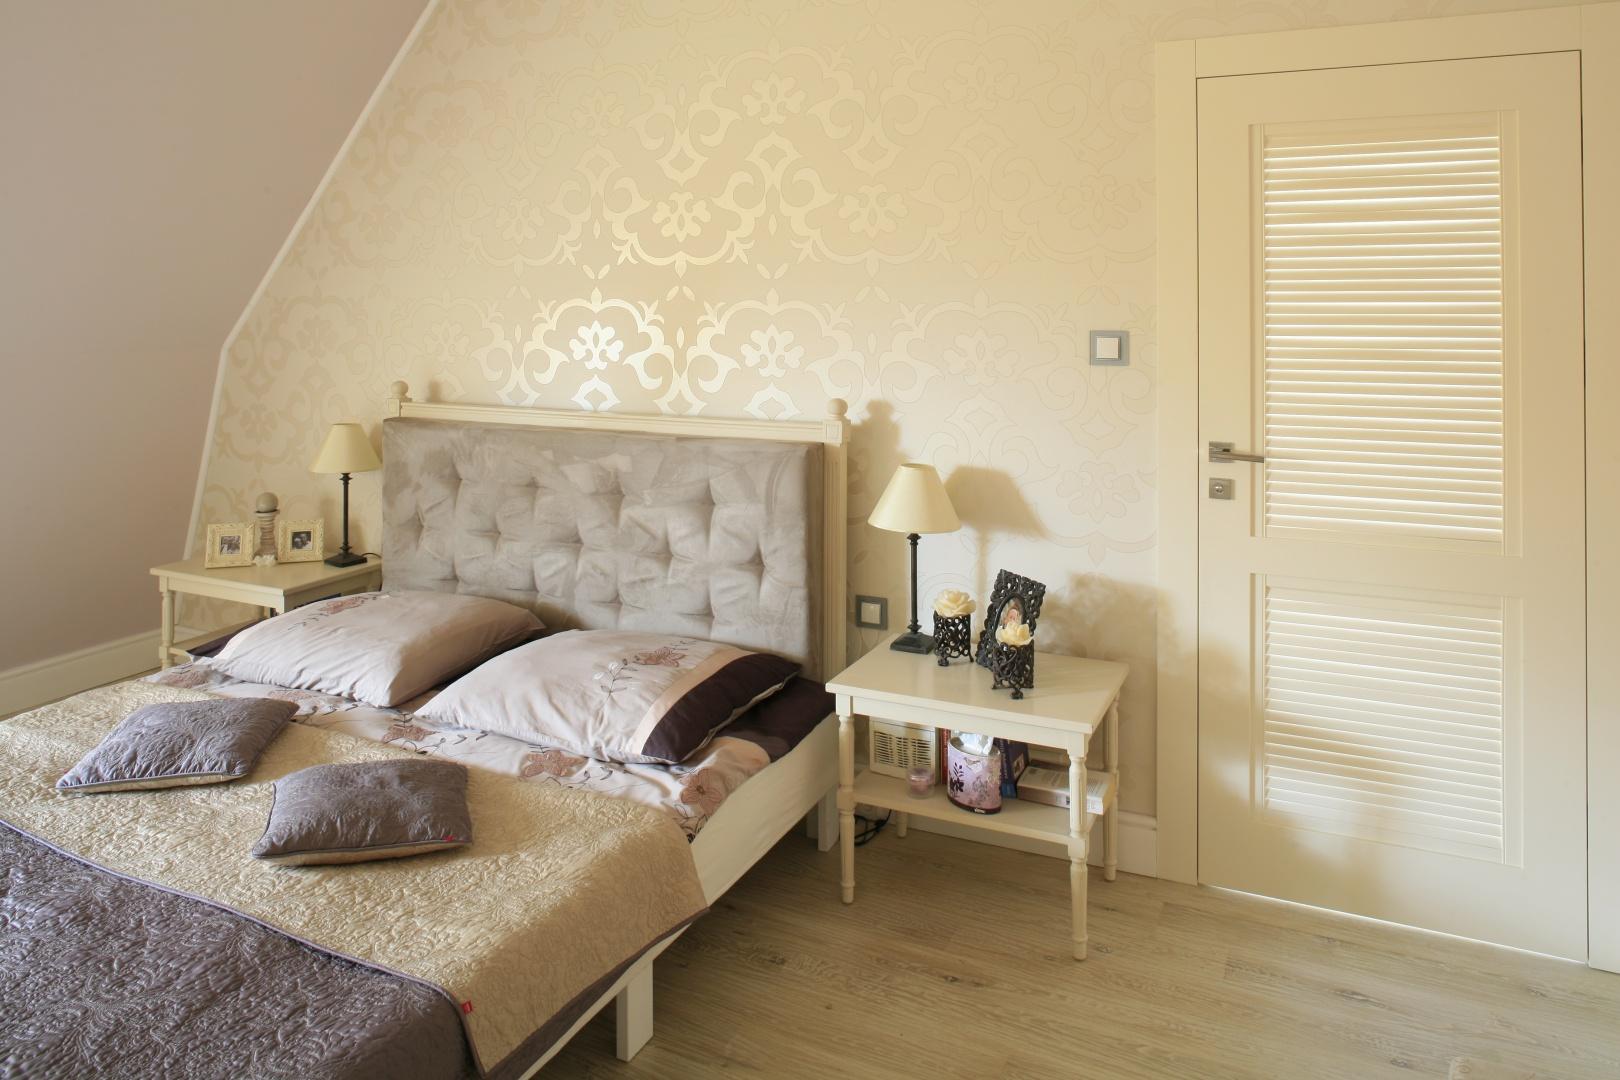 Romantyczna Klasyczna Sypialnia Na Poddaszu Galeria